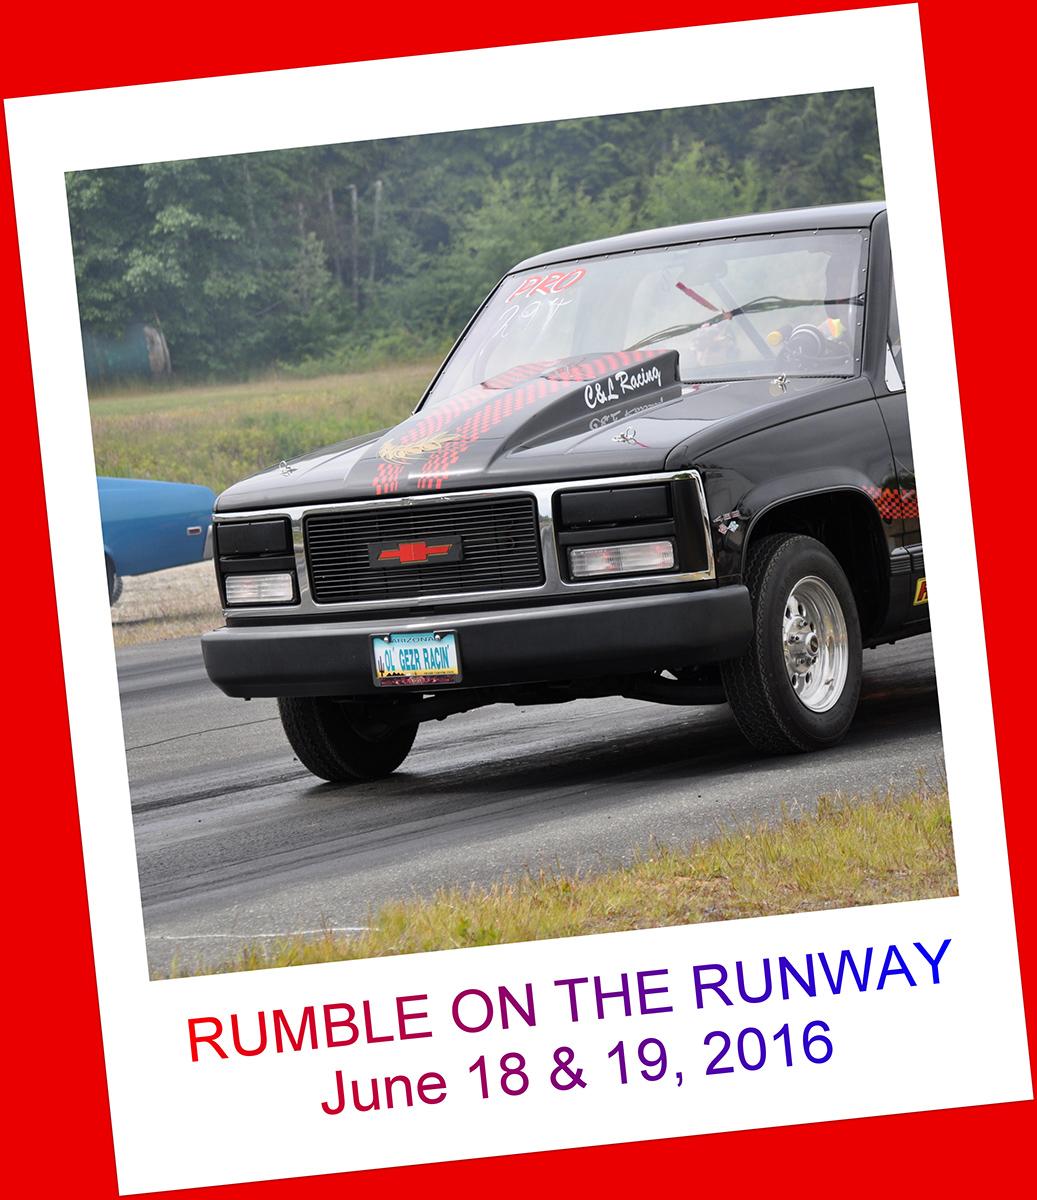 Rumble on the Runway June 18 & 19, 2016 1274